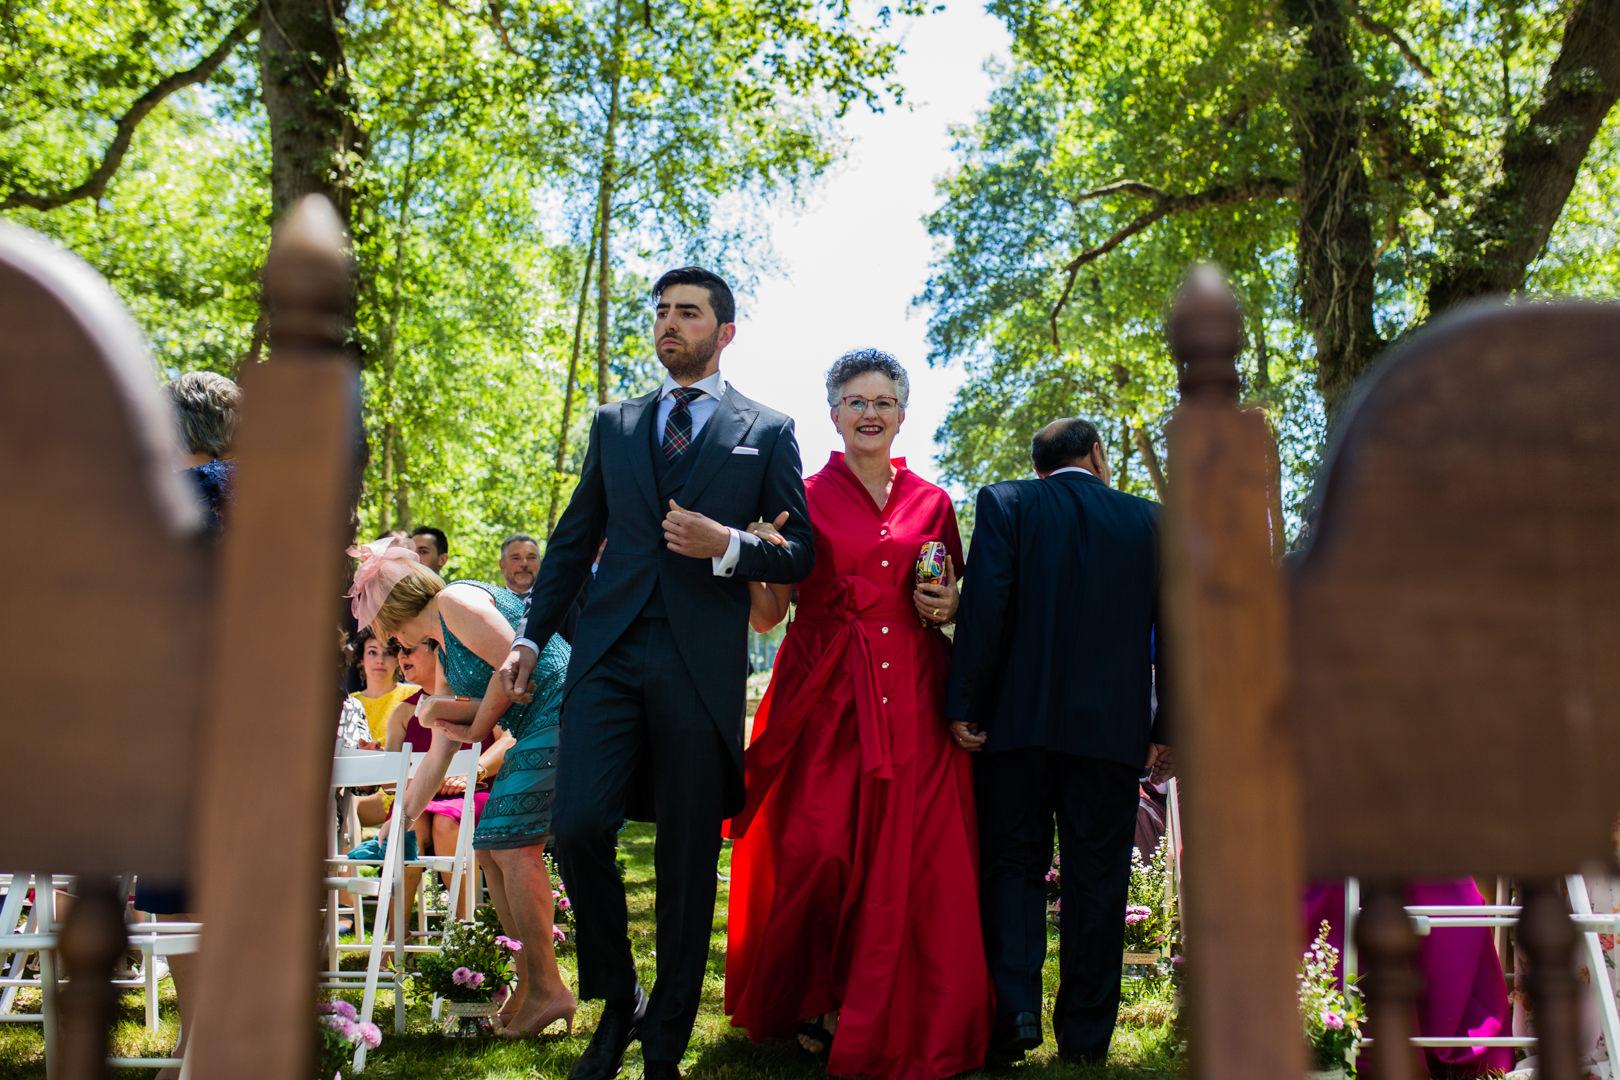 Boda-Lucia-Javi-Lugo-Rafael-Torres-fotografo-bodas-sevilla-madrid-barcelona-wedding-photographer--19.jpg